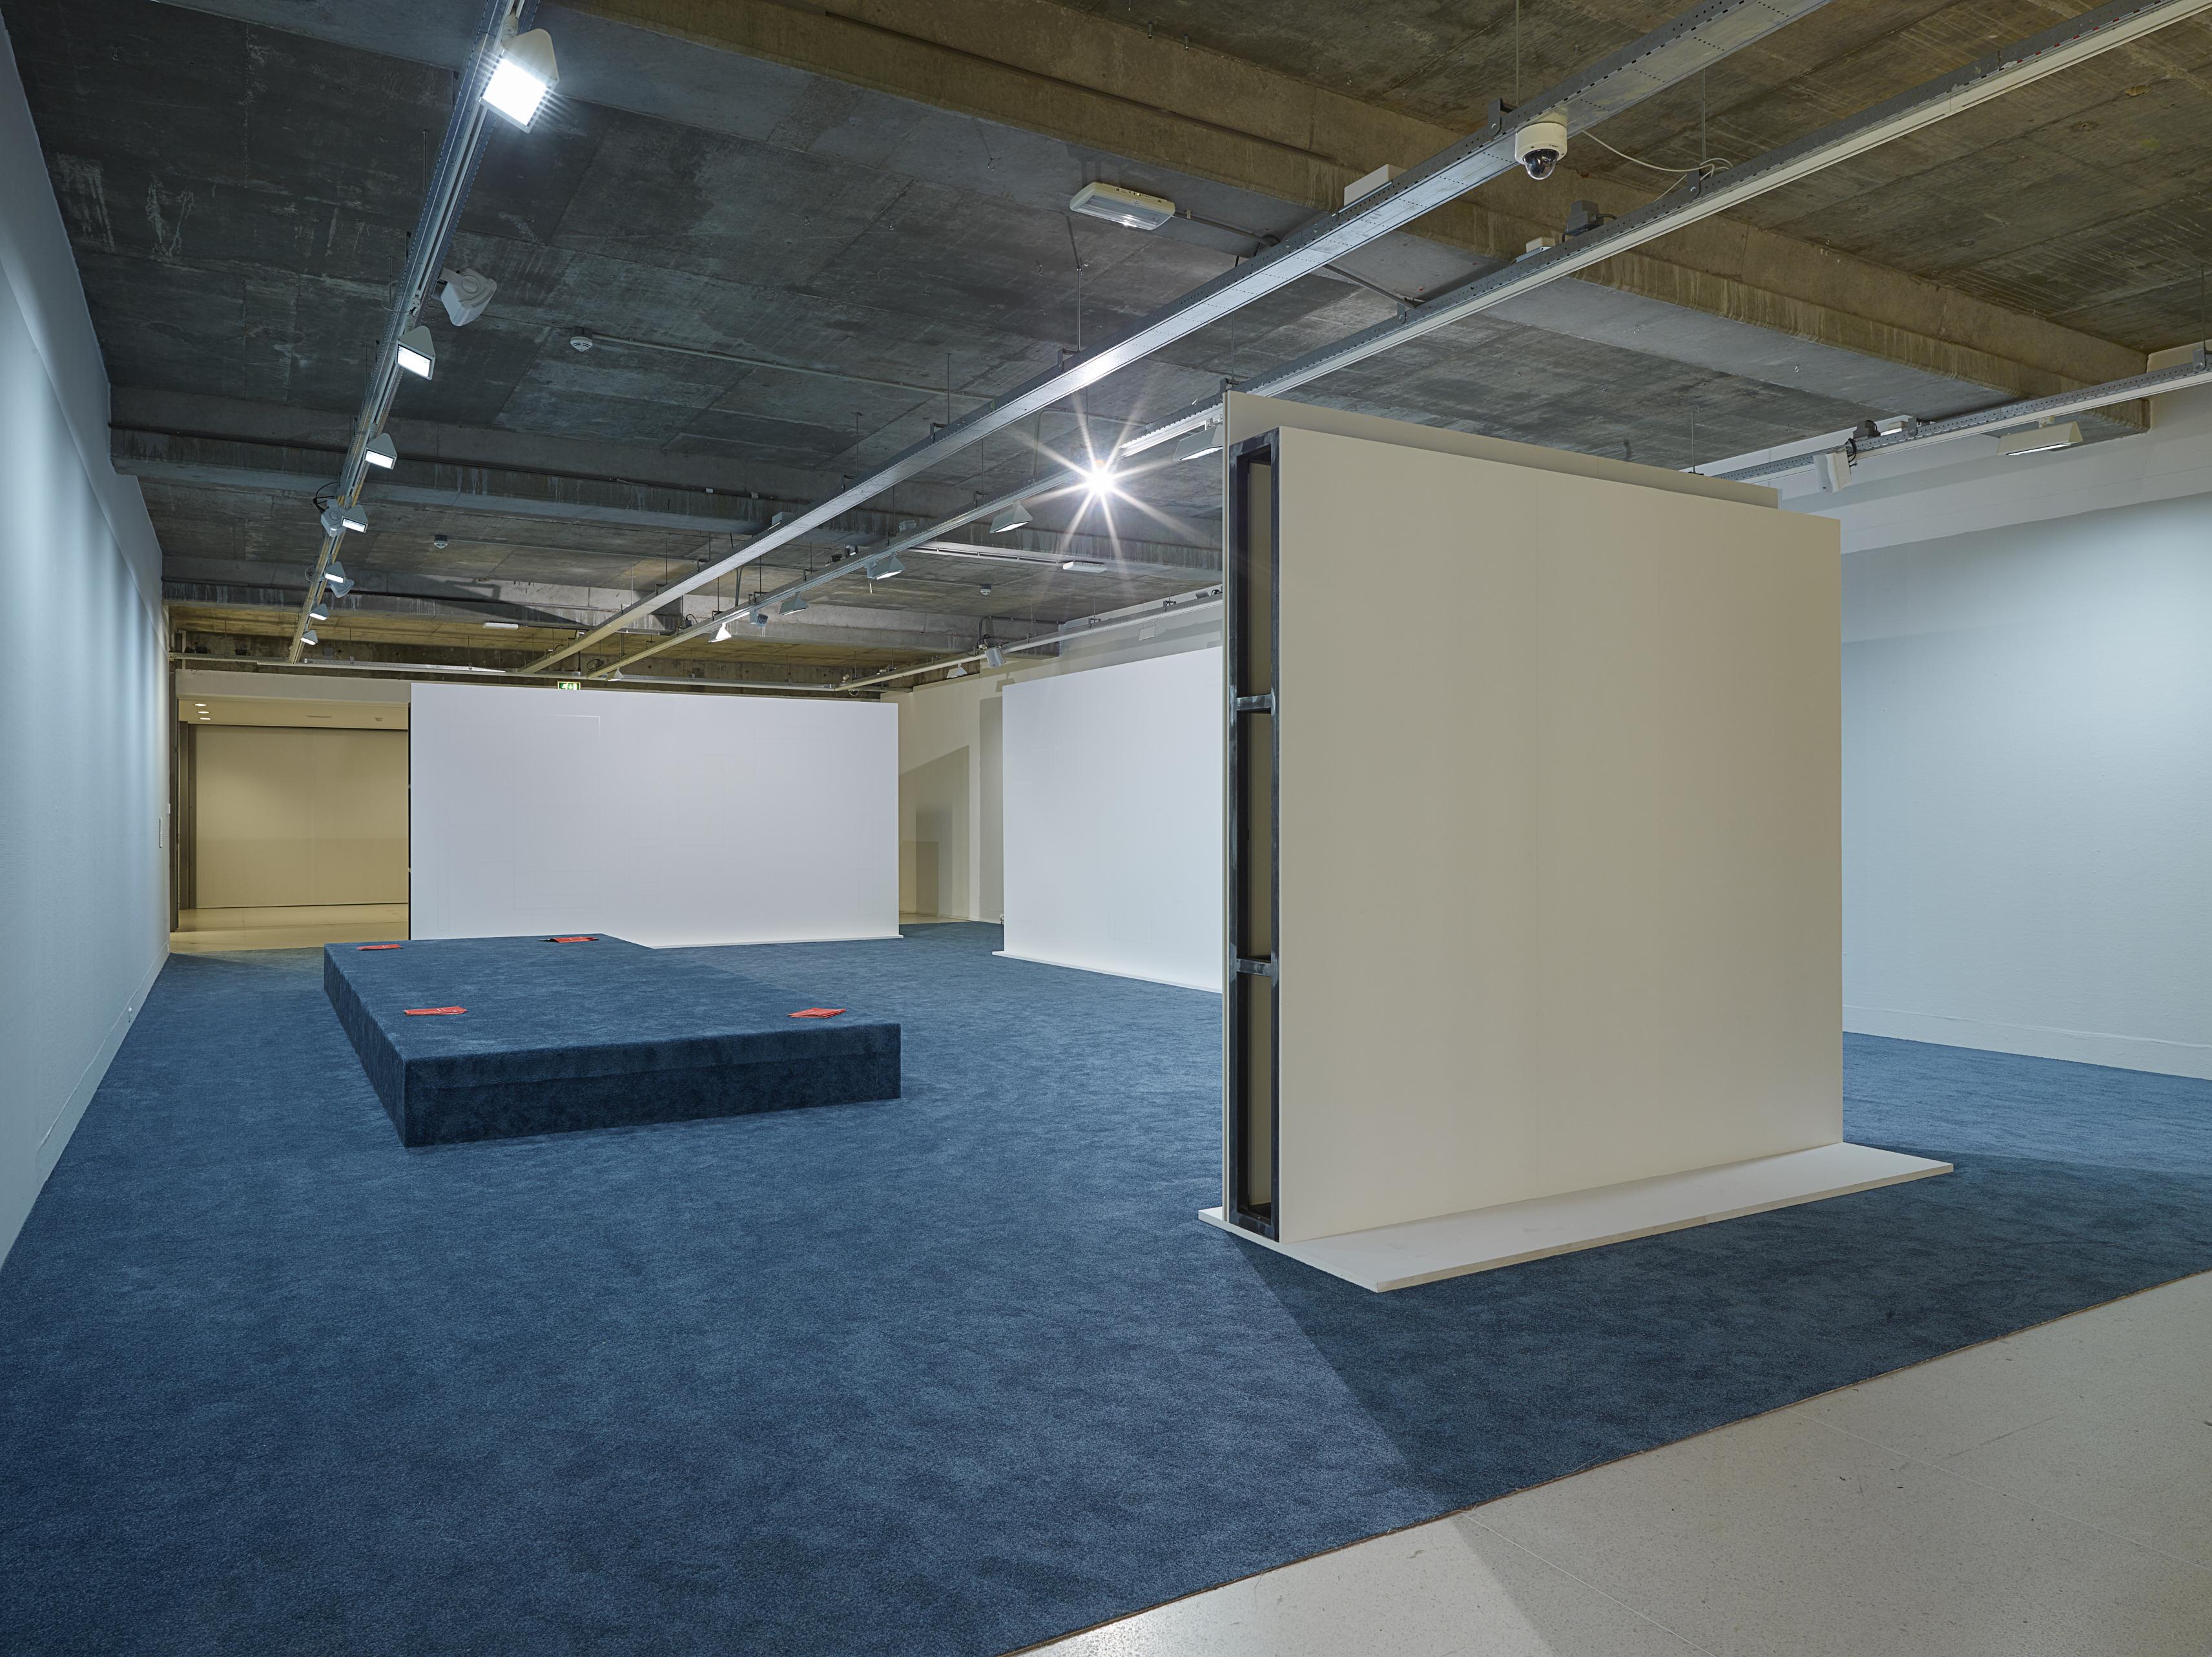 Sensory Spaces 10: Olaf Nicolai